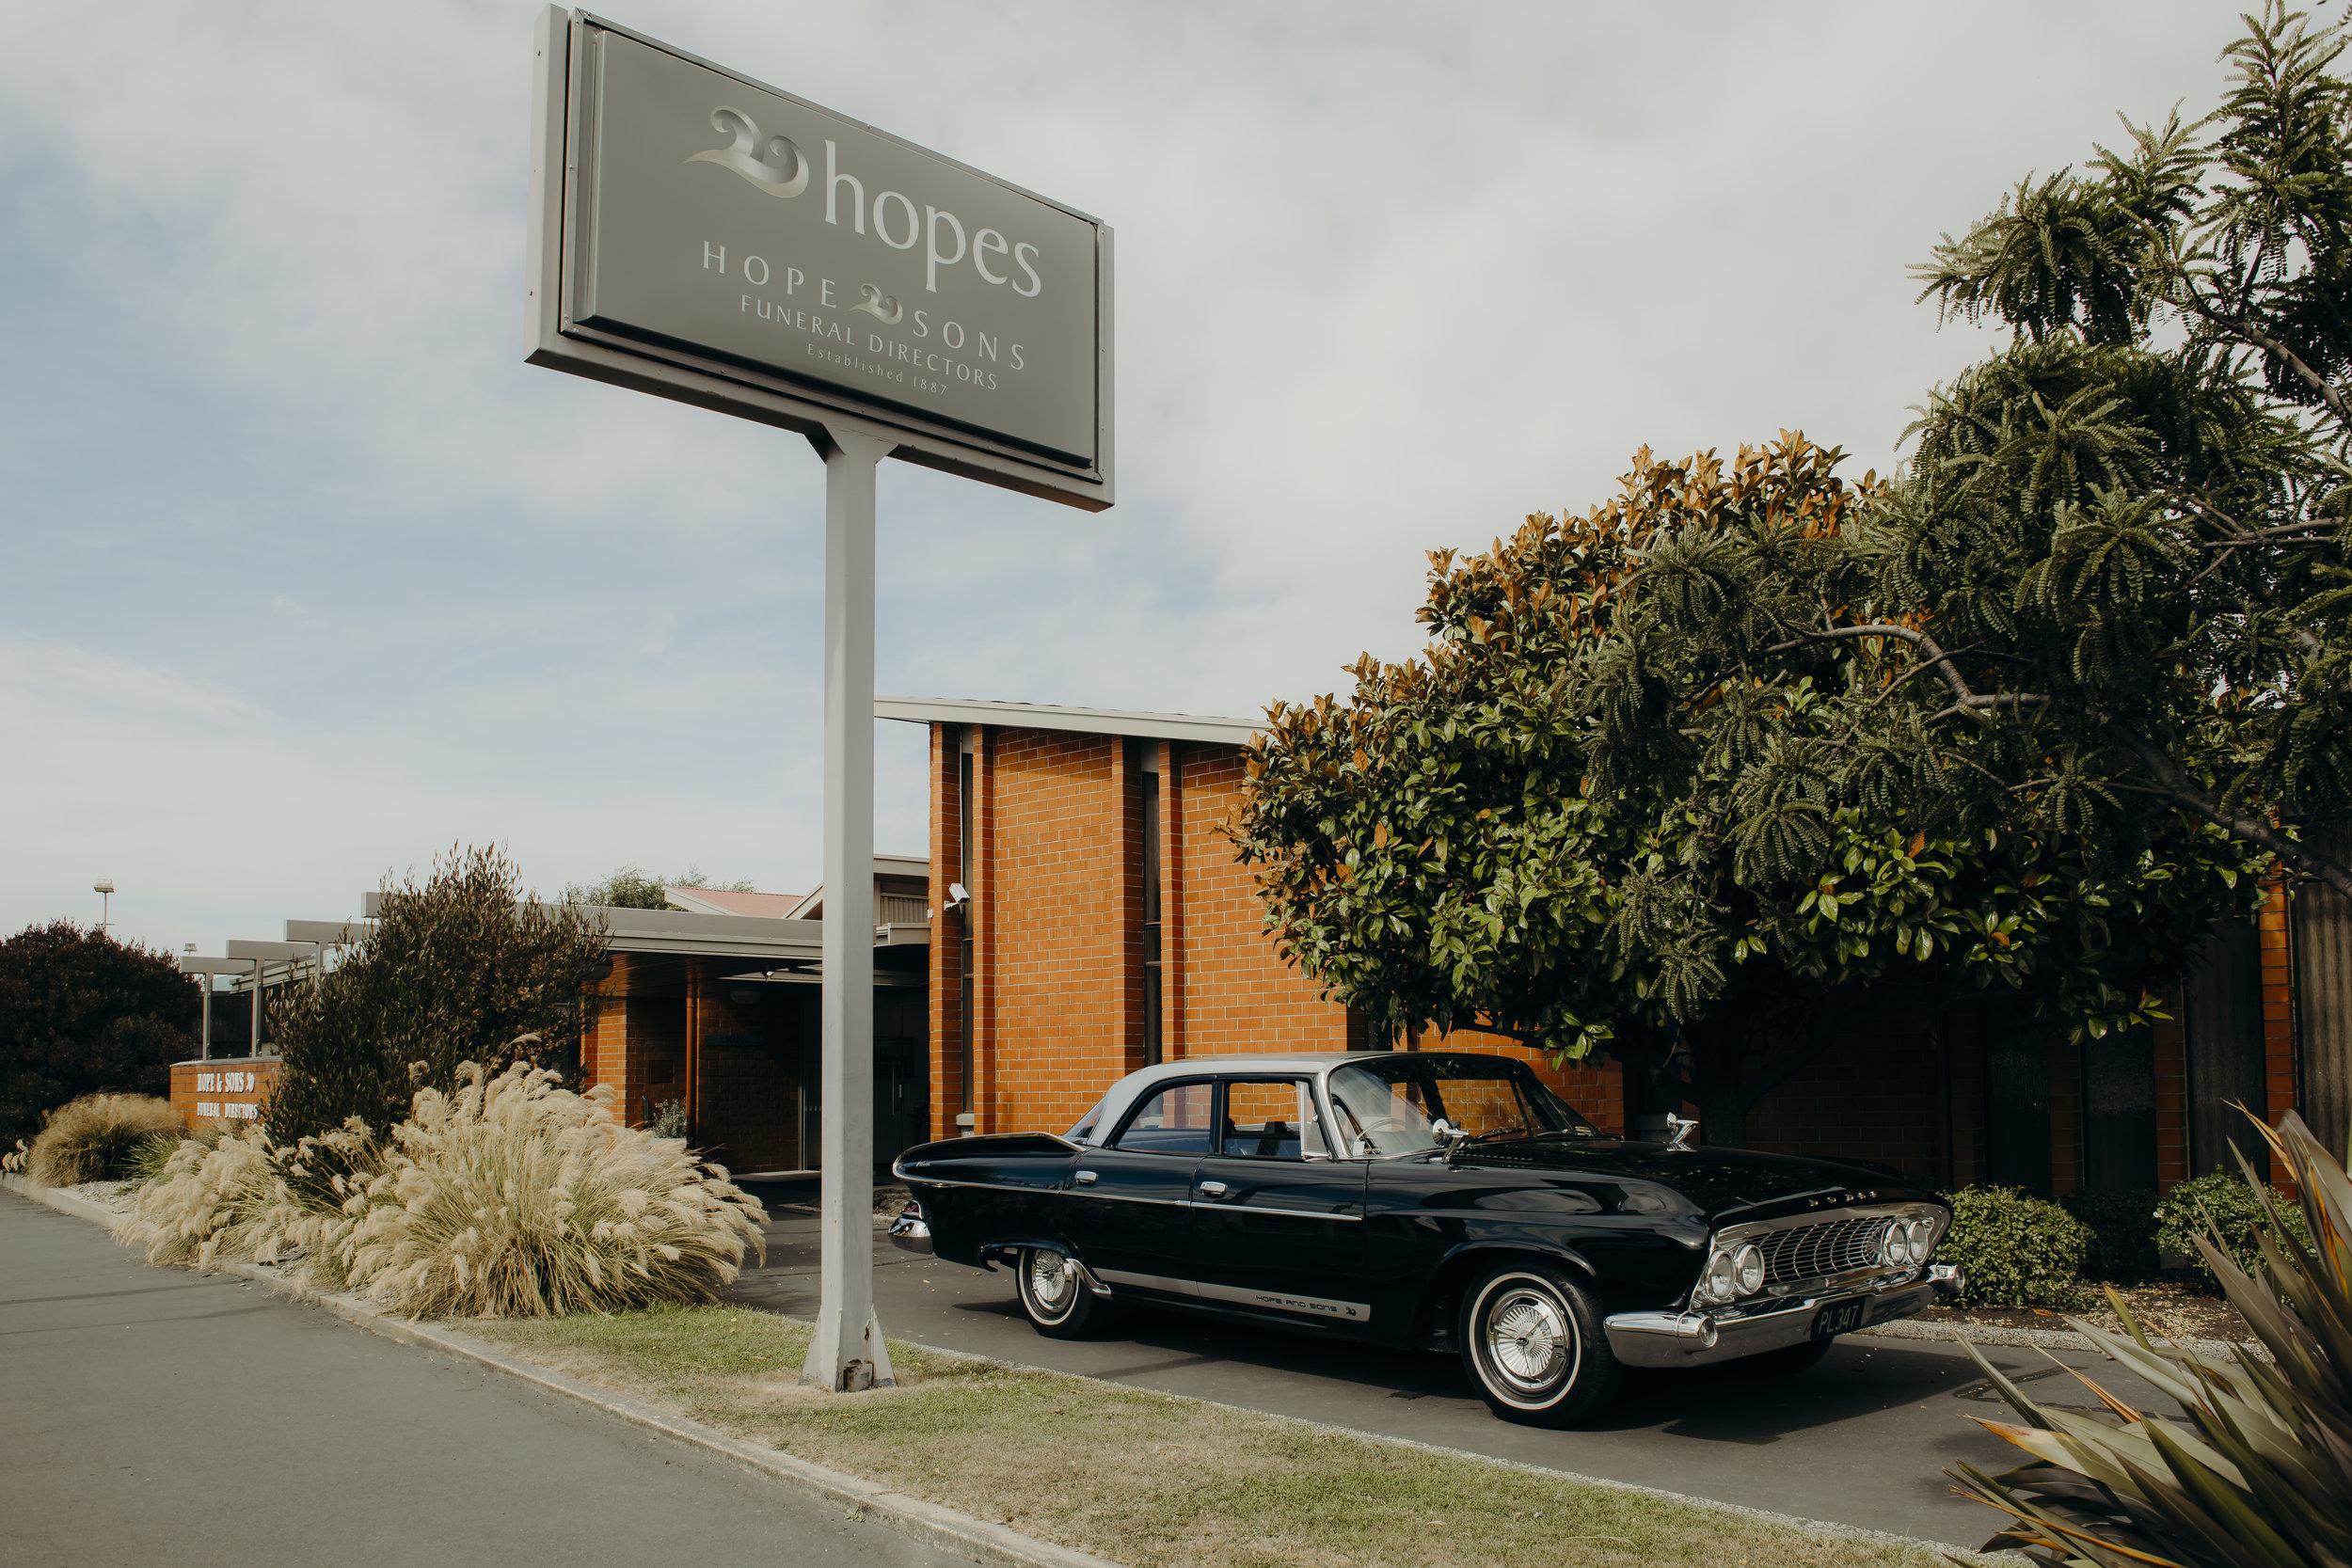 Hope and Sons — Funeral Directors, Dunedin, New Zealand